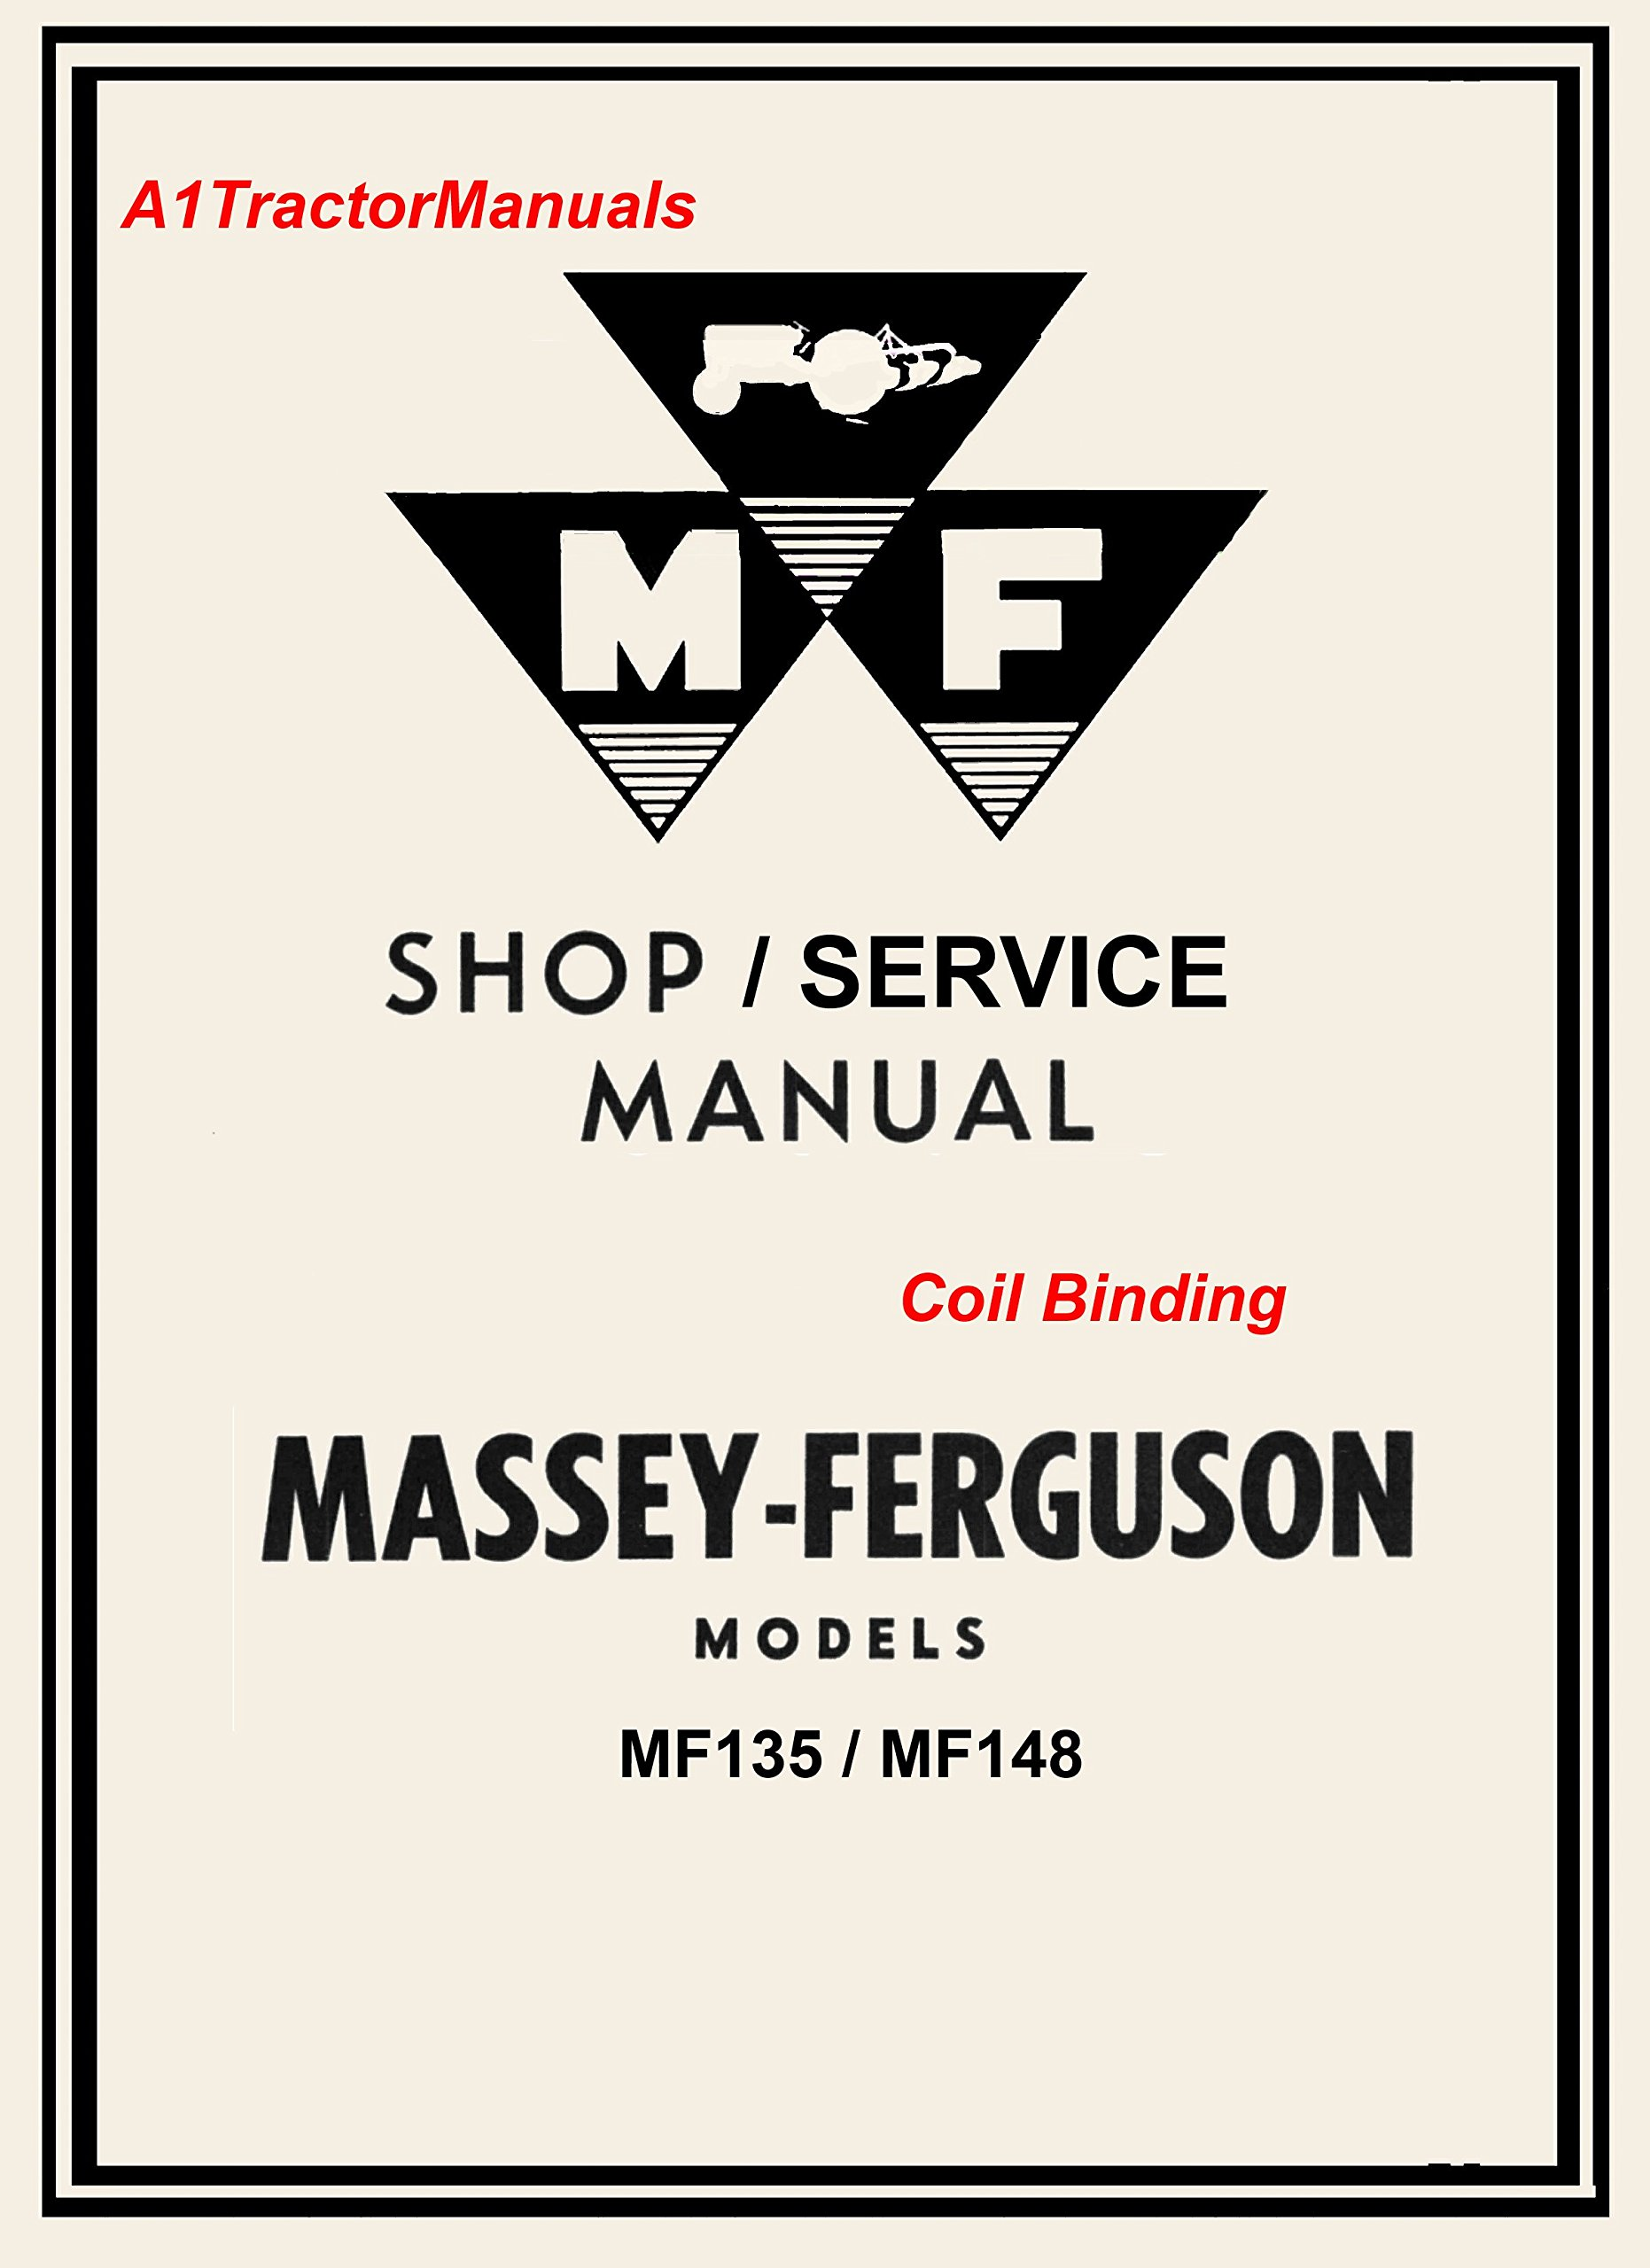 Massey Ferguson Mf135 Mf148 Shop/service Manual: Massey Ferguson ...